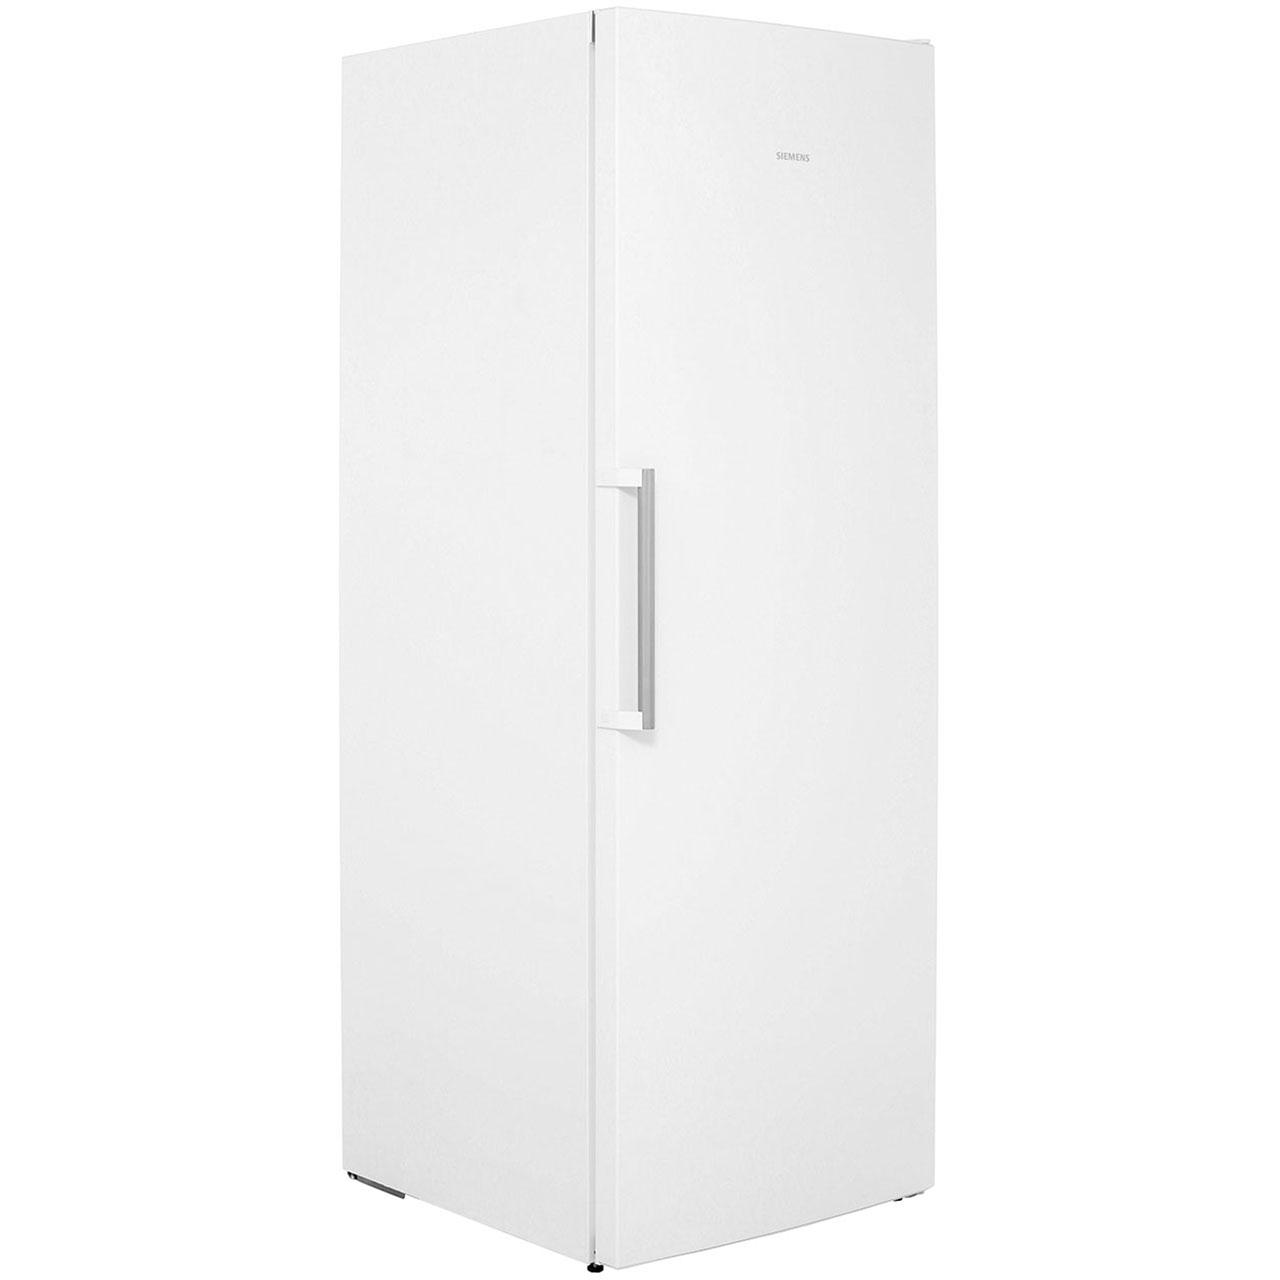 siemens iq 500 upright freezer gs58naw41. Black Bedroom Furniture Sets. Home Design Ideas